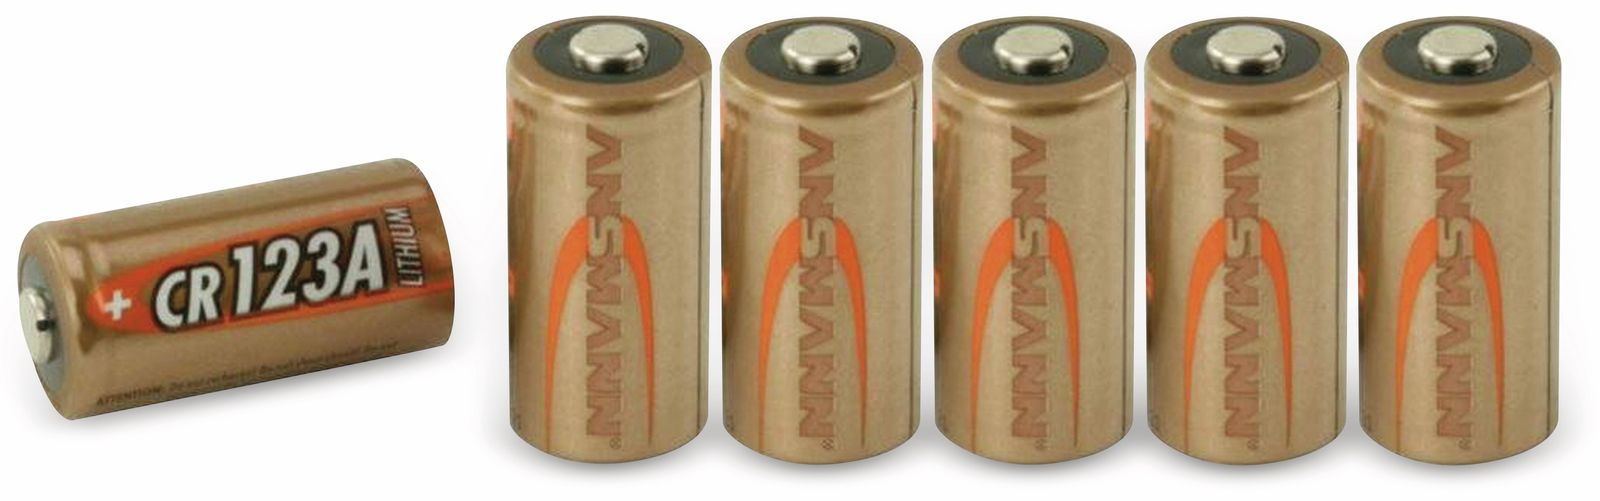 lithium batterie ansmann cr123a 6 st ck online kaufen. Black Bedroom Furniture Sets. Home Design Ideas